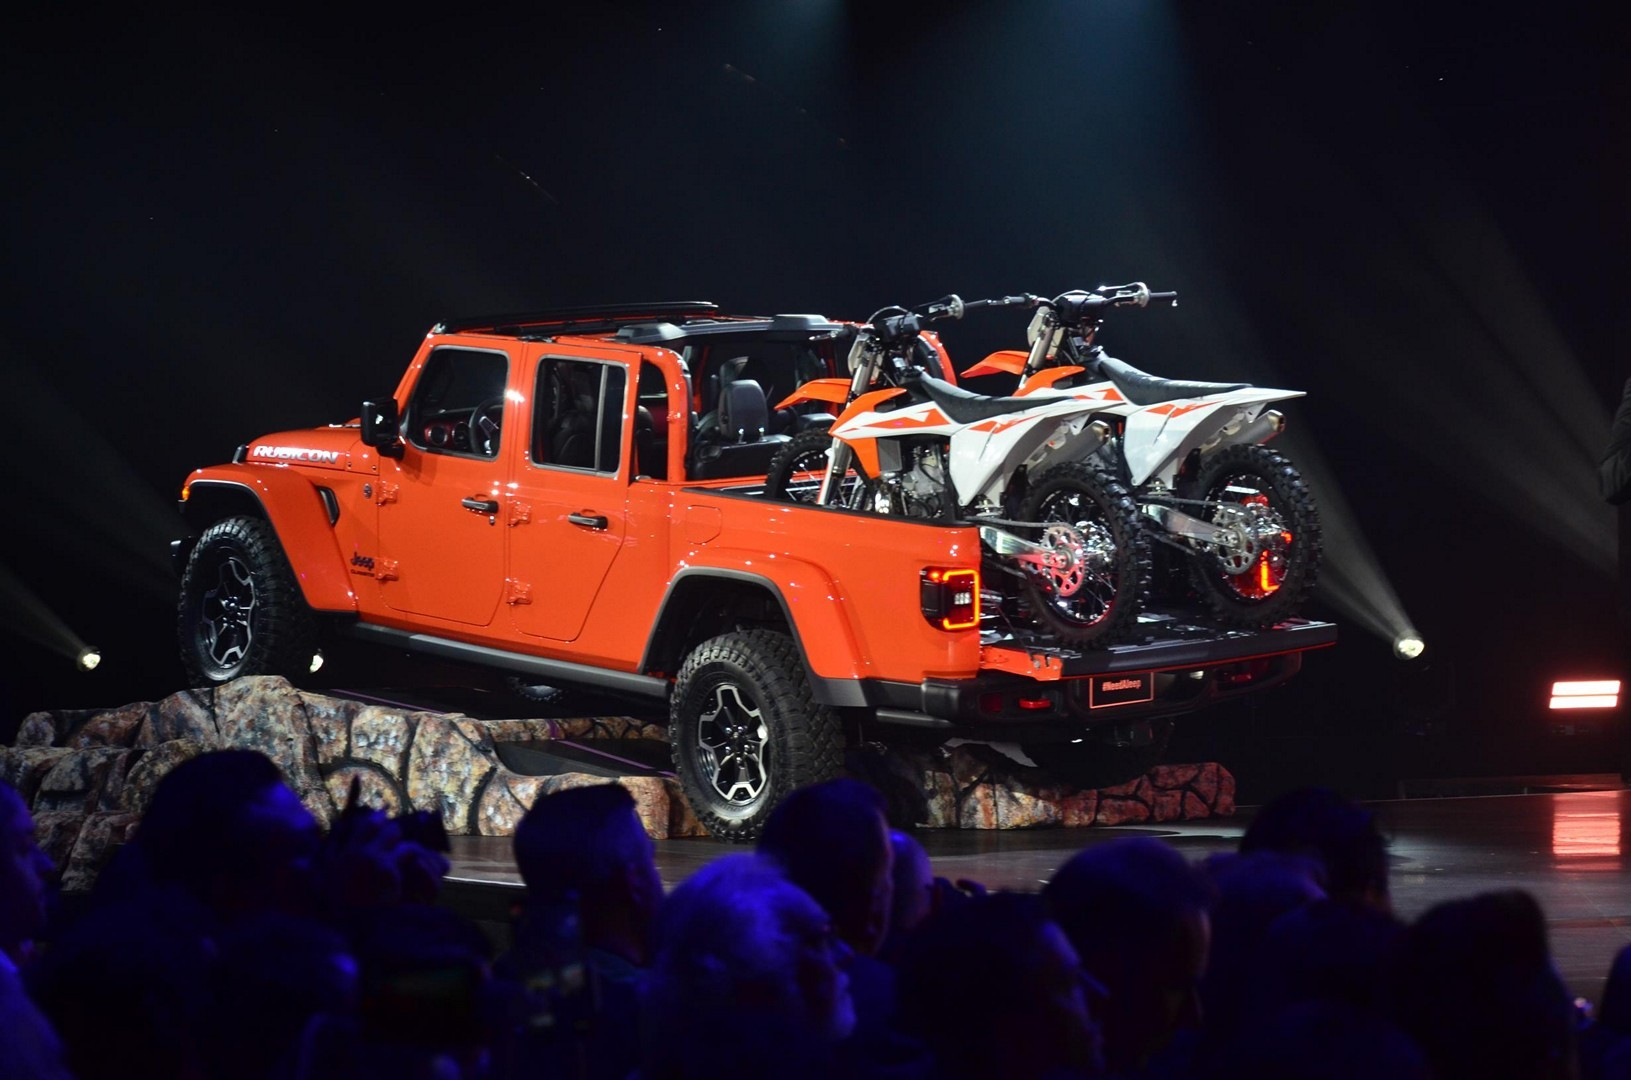 Jeep Wrangler Seats >> 2020 Jeep Gladiator Looks Impressive at the LA Auto Show - autoevolution